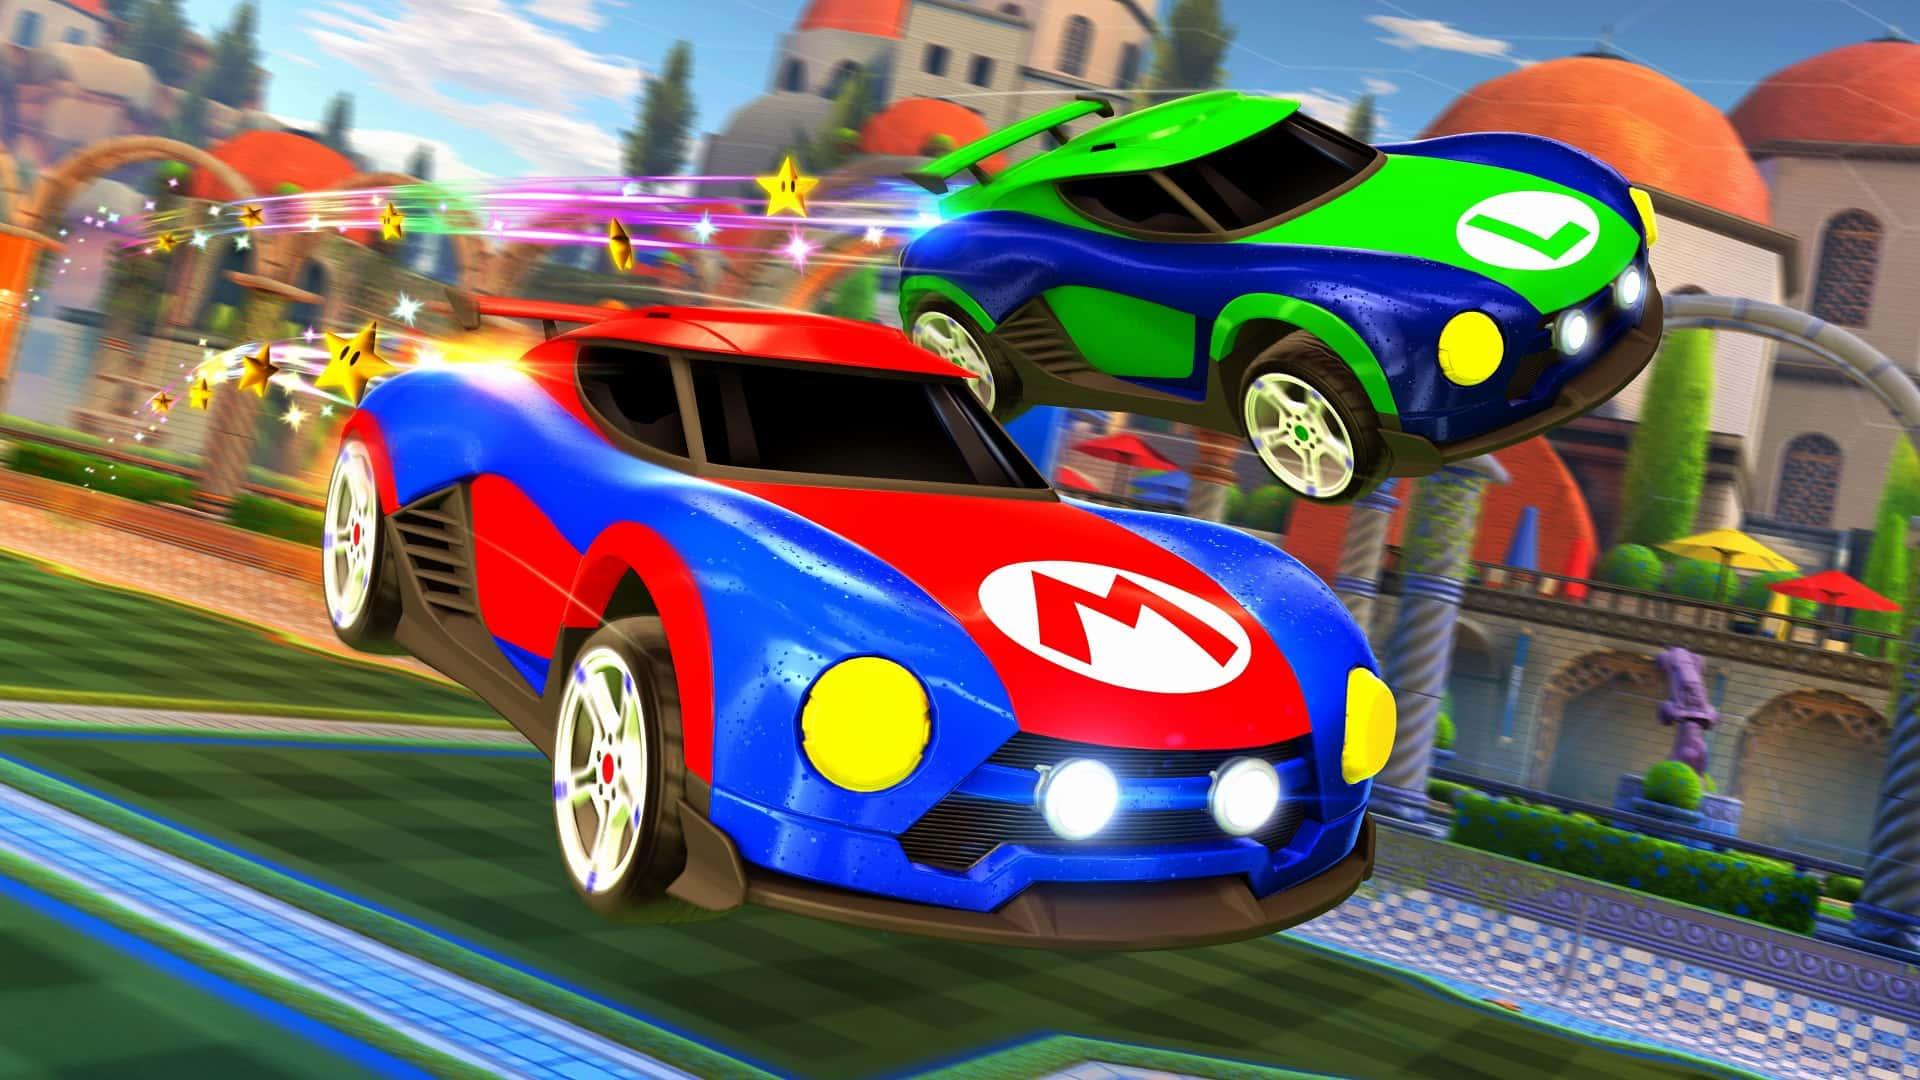 Conheçam os veículos exclusivos de Rocket League na Nintendo Switch